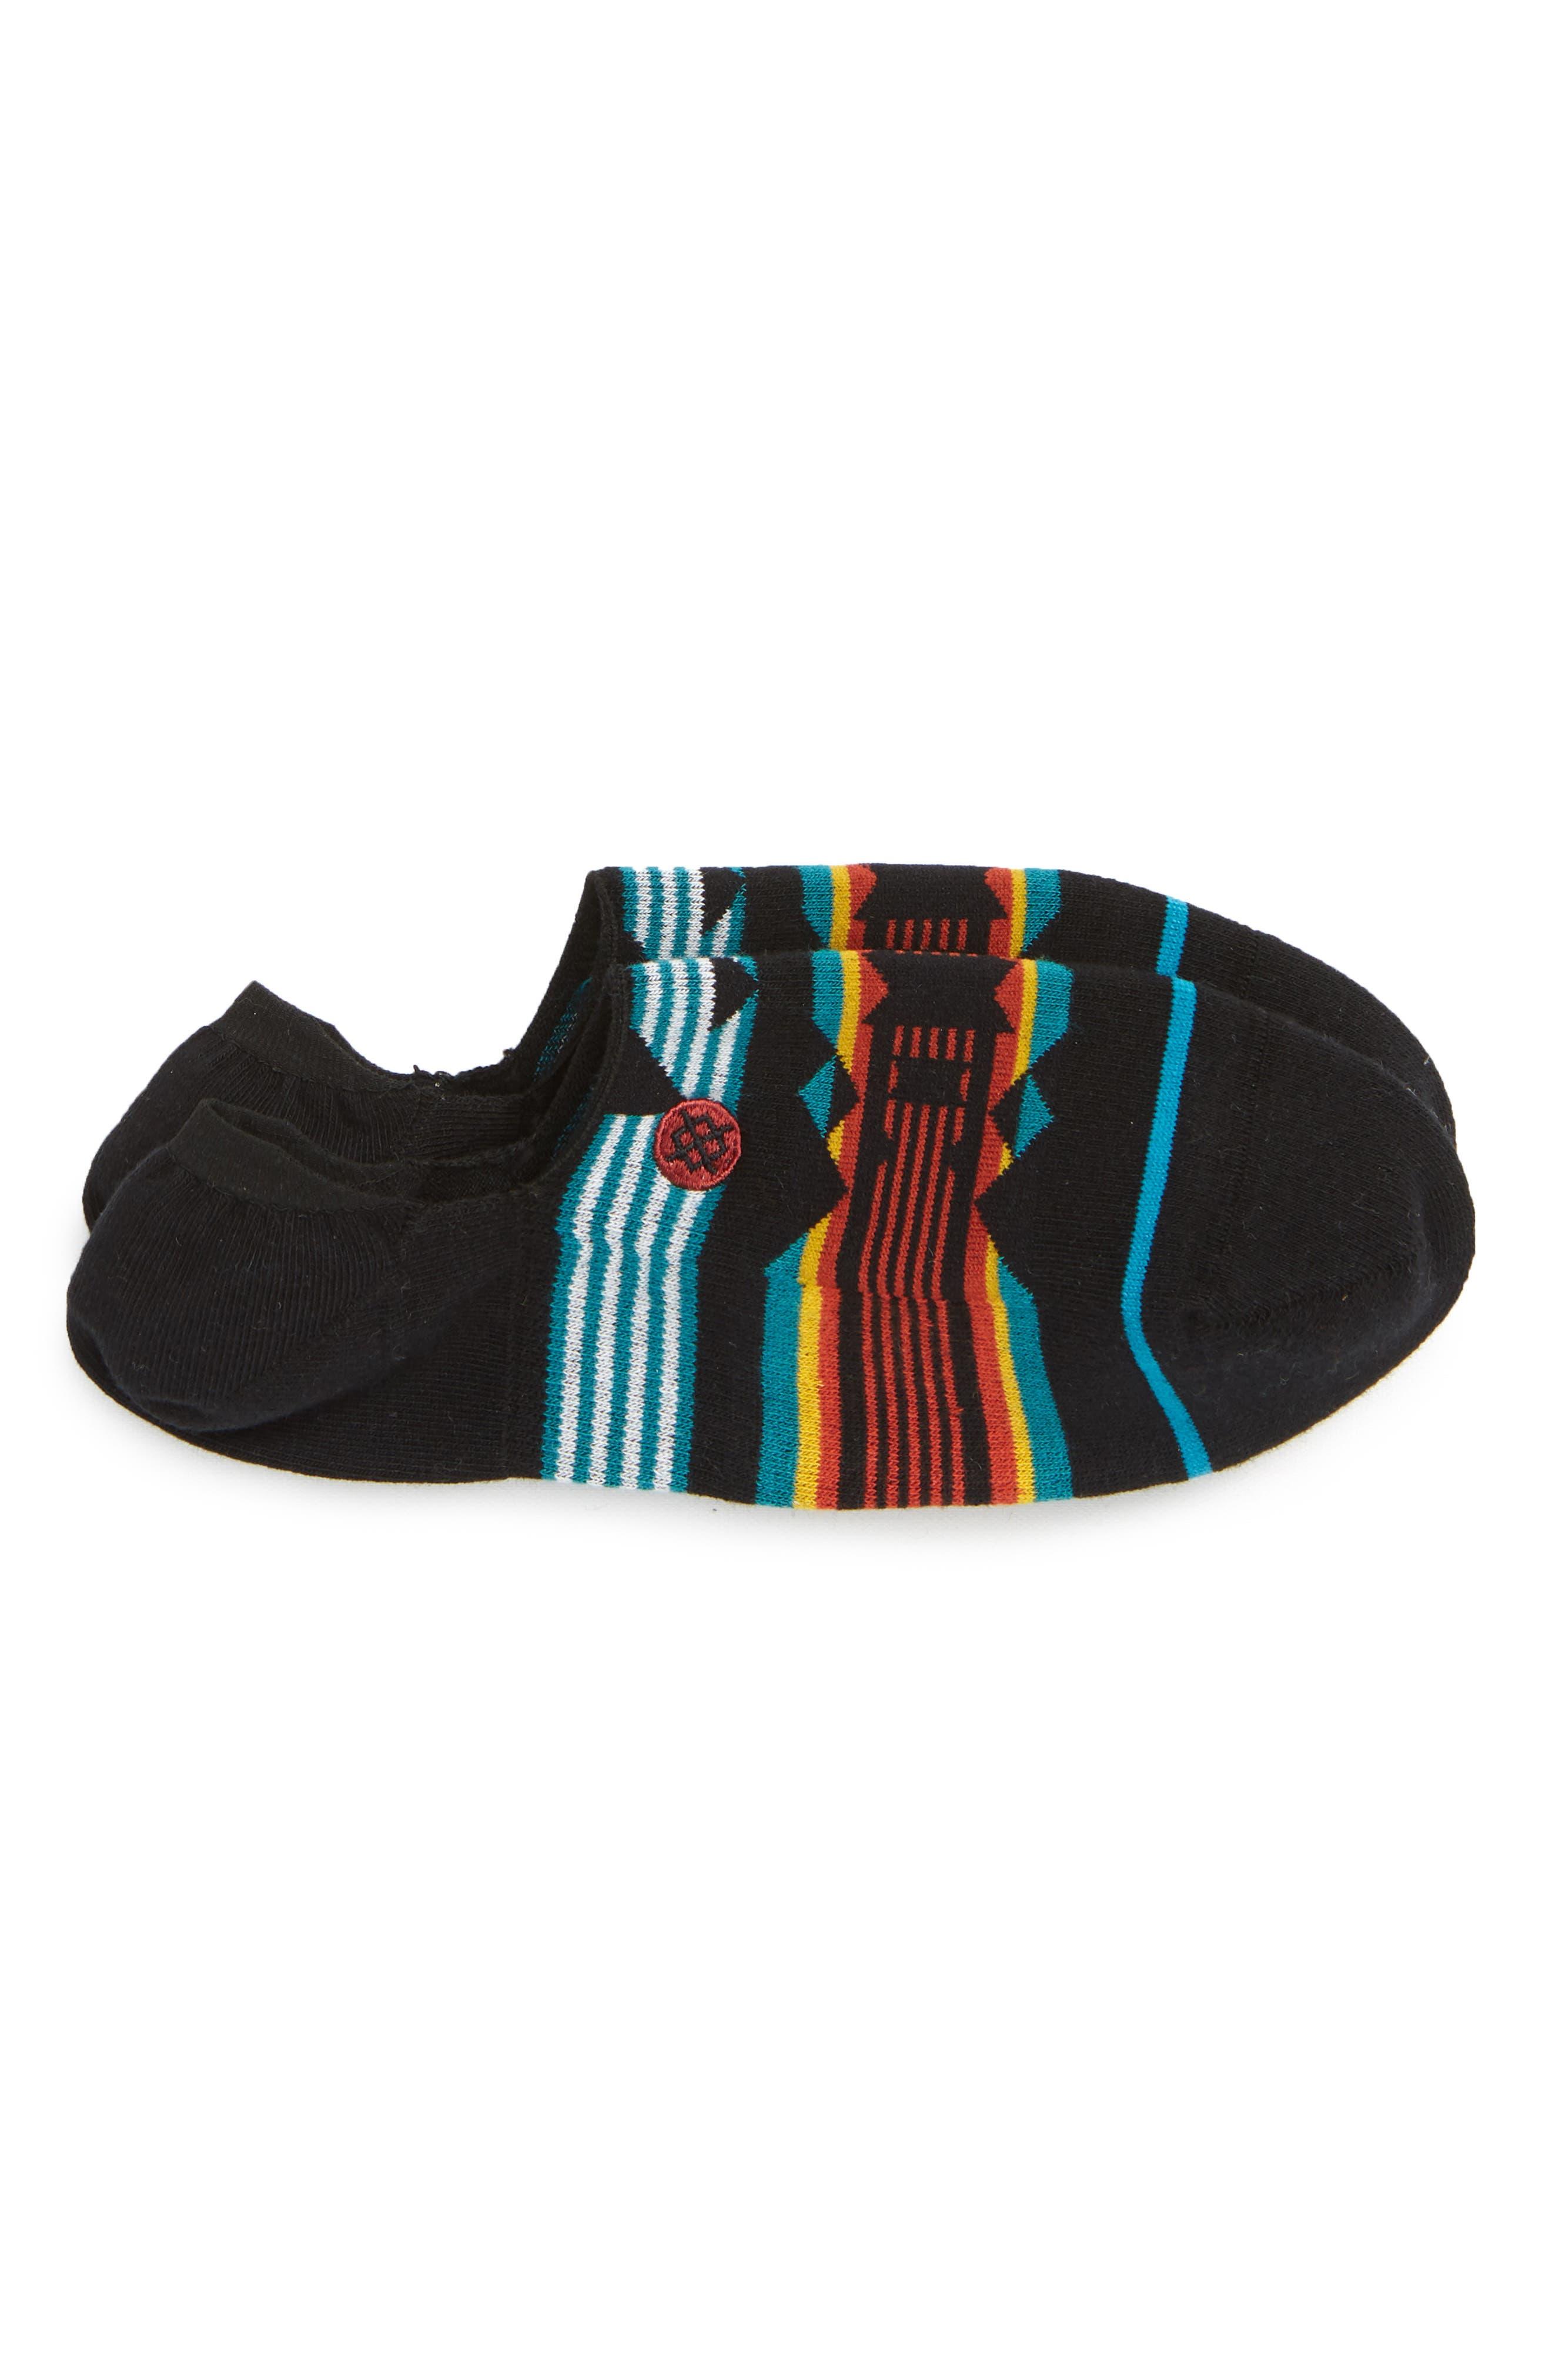 Cedergren Low Socks,                         Main,                         color, 001